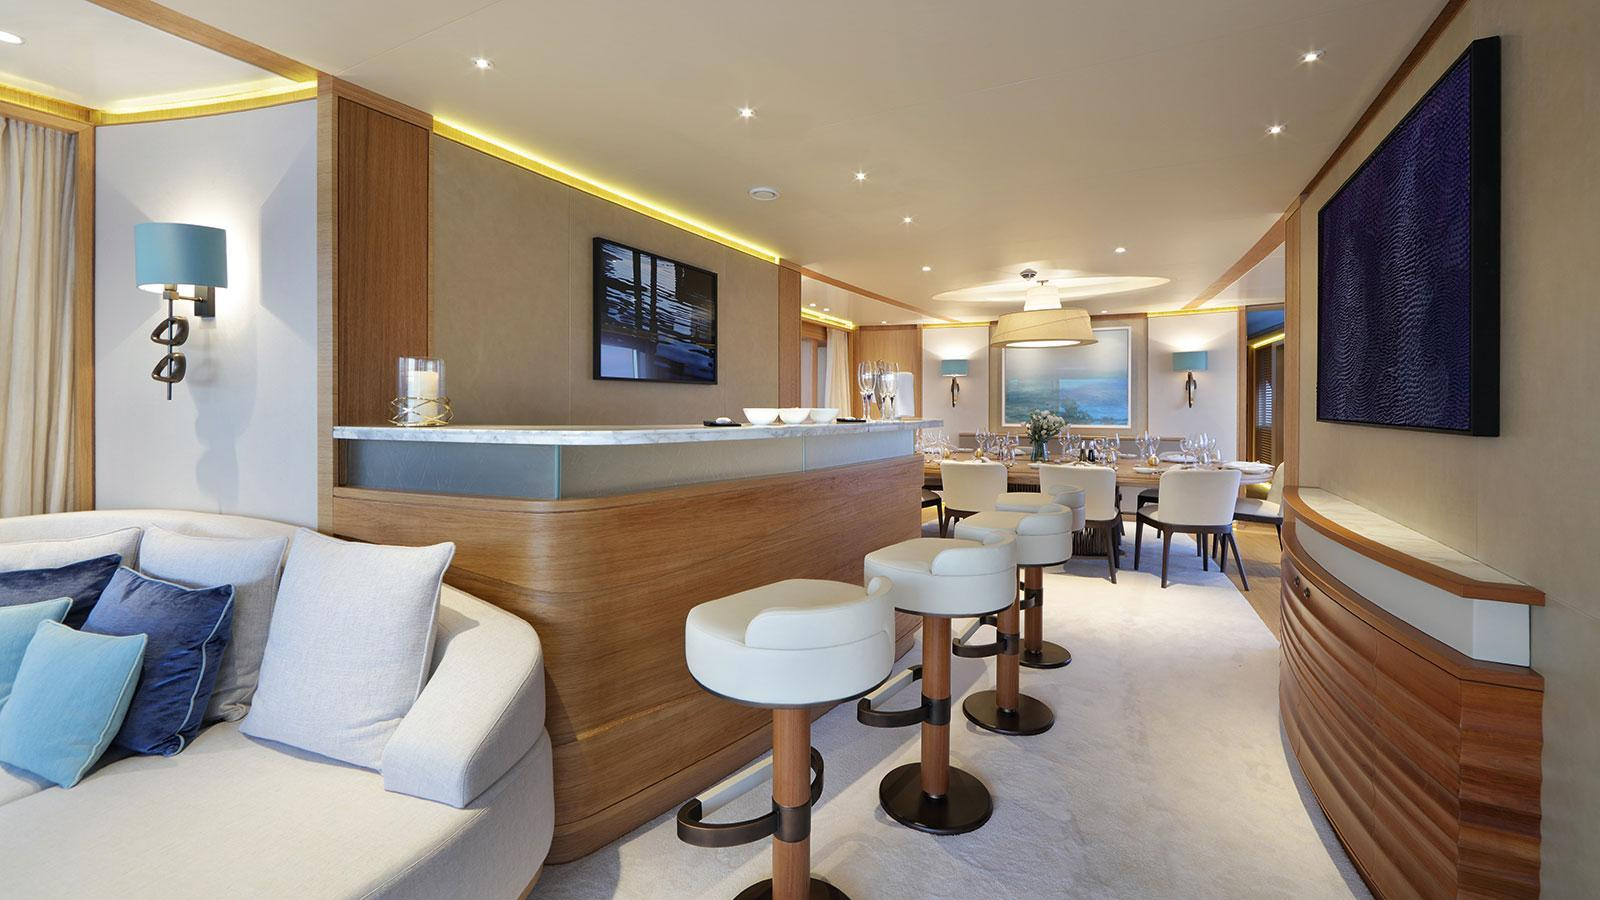 solis-motor-yacht-mulder-2015-34m-bar